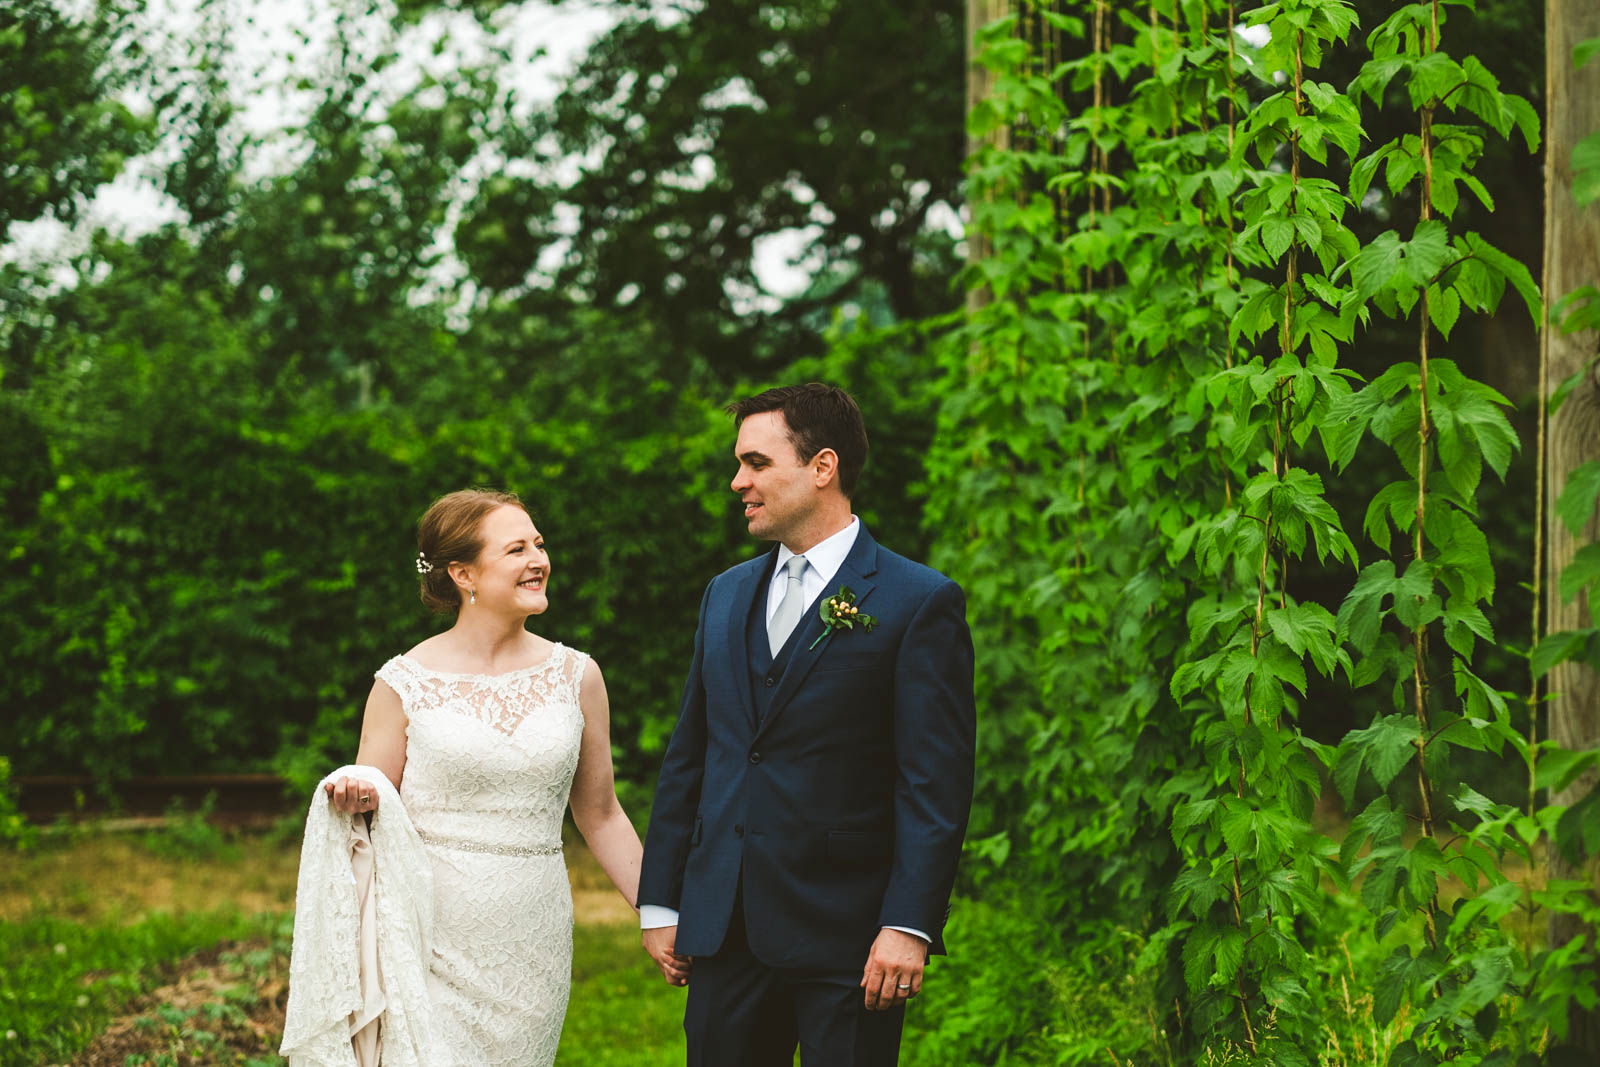 Maumee Bay Brewing Company Hop Gardens on Wedding Day in Toledo Ohio